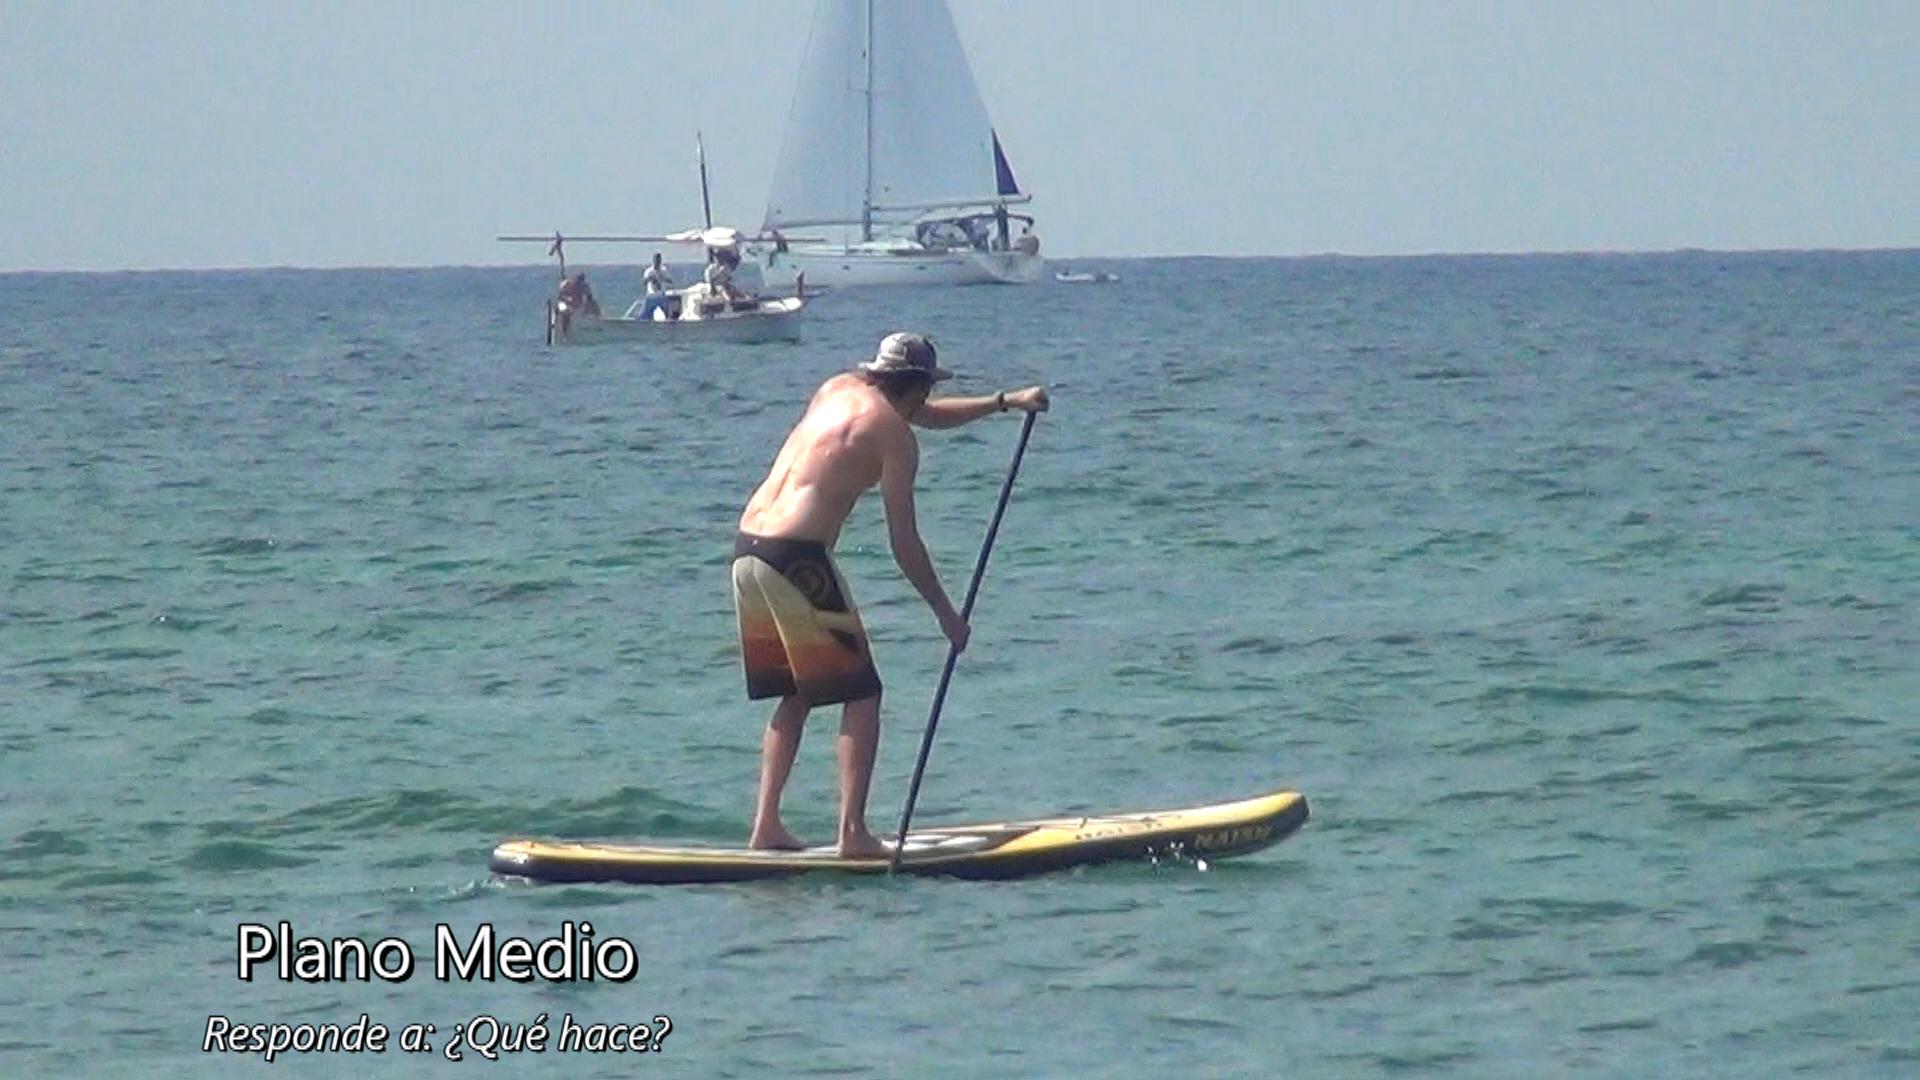 plano medio detective surf